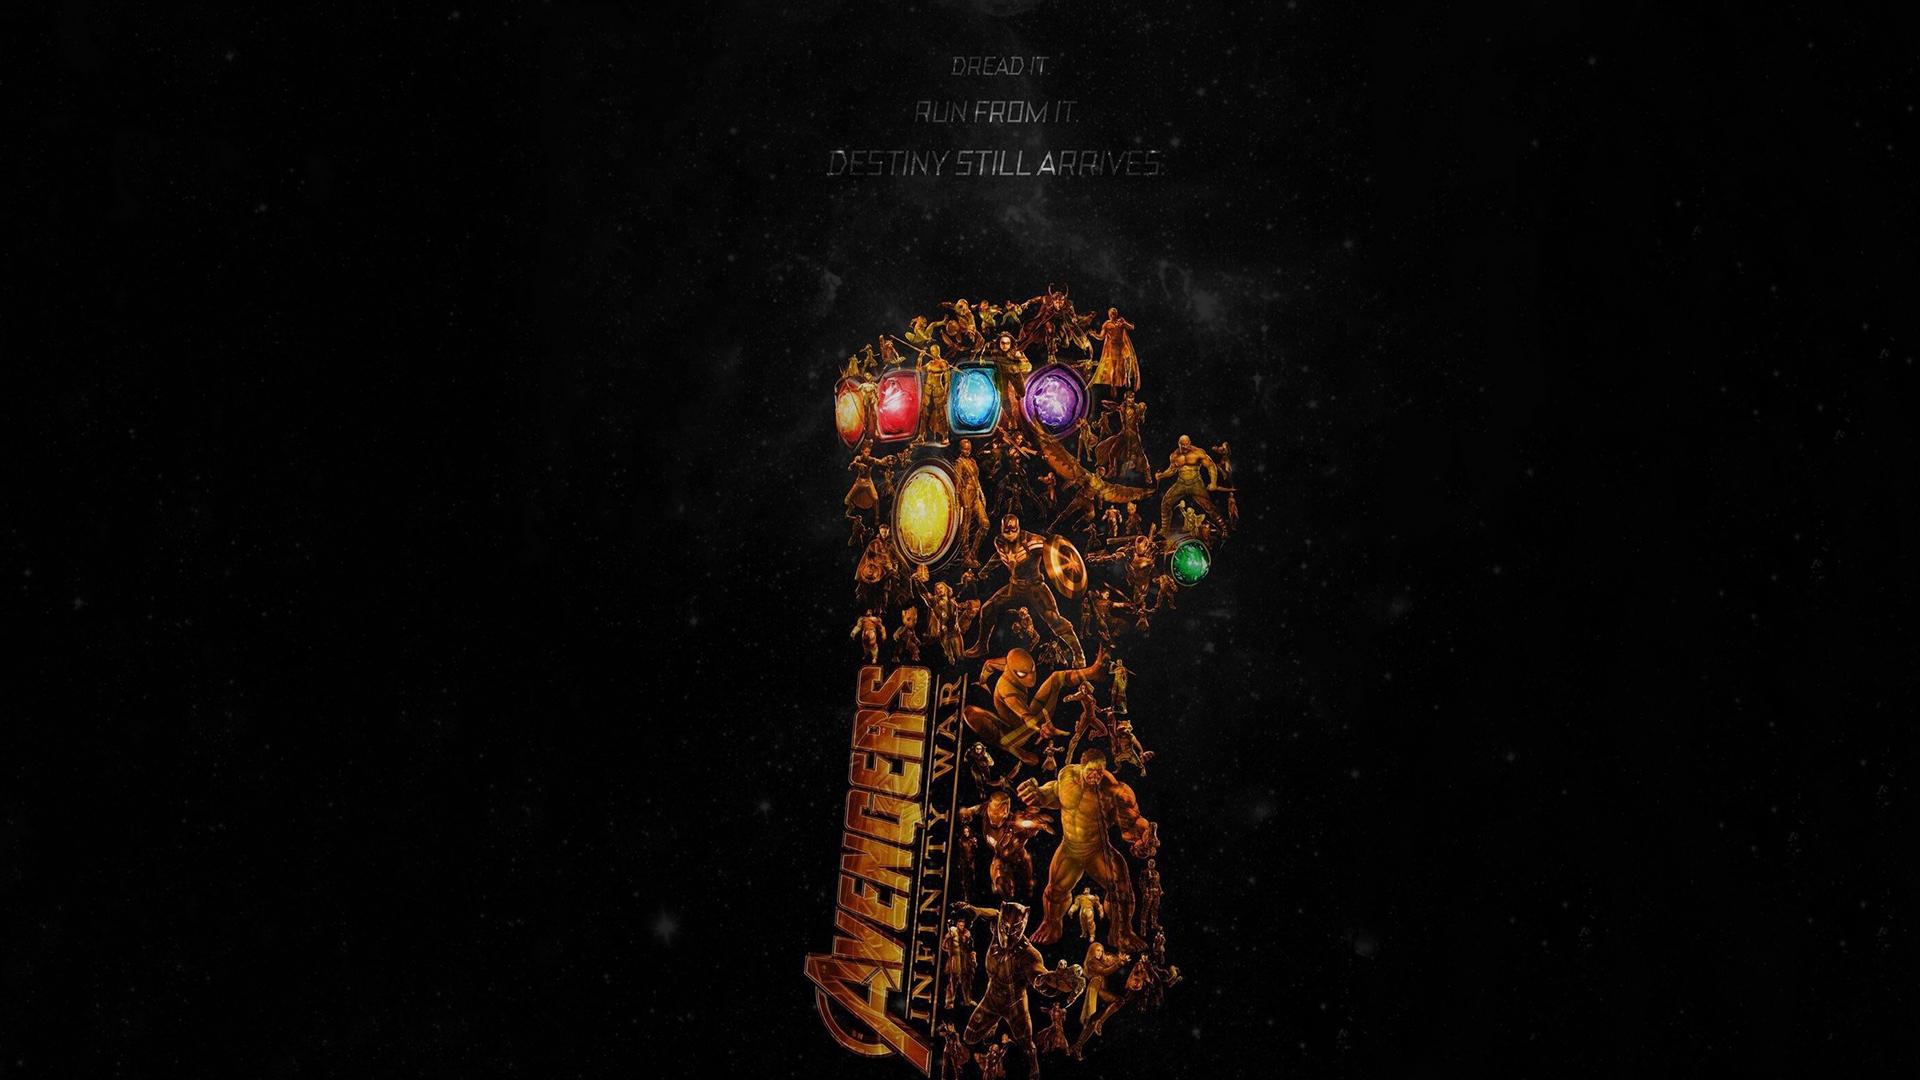 10 New Avengers Infinity War Desktop Wallpaper Full Hd: Avengers Infinity War Latest Poster, Full HD Wallpaper